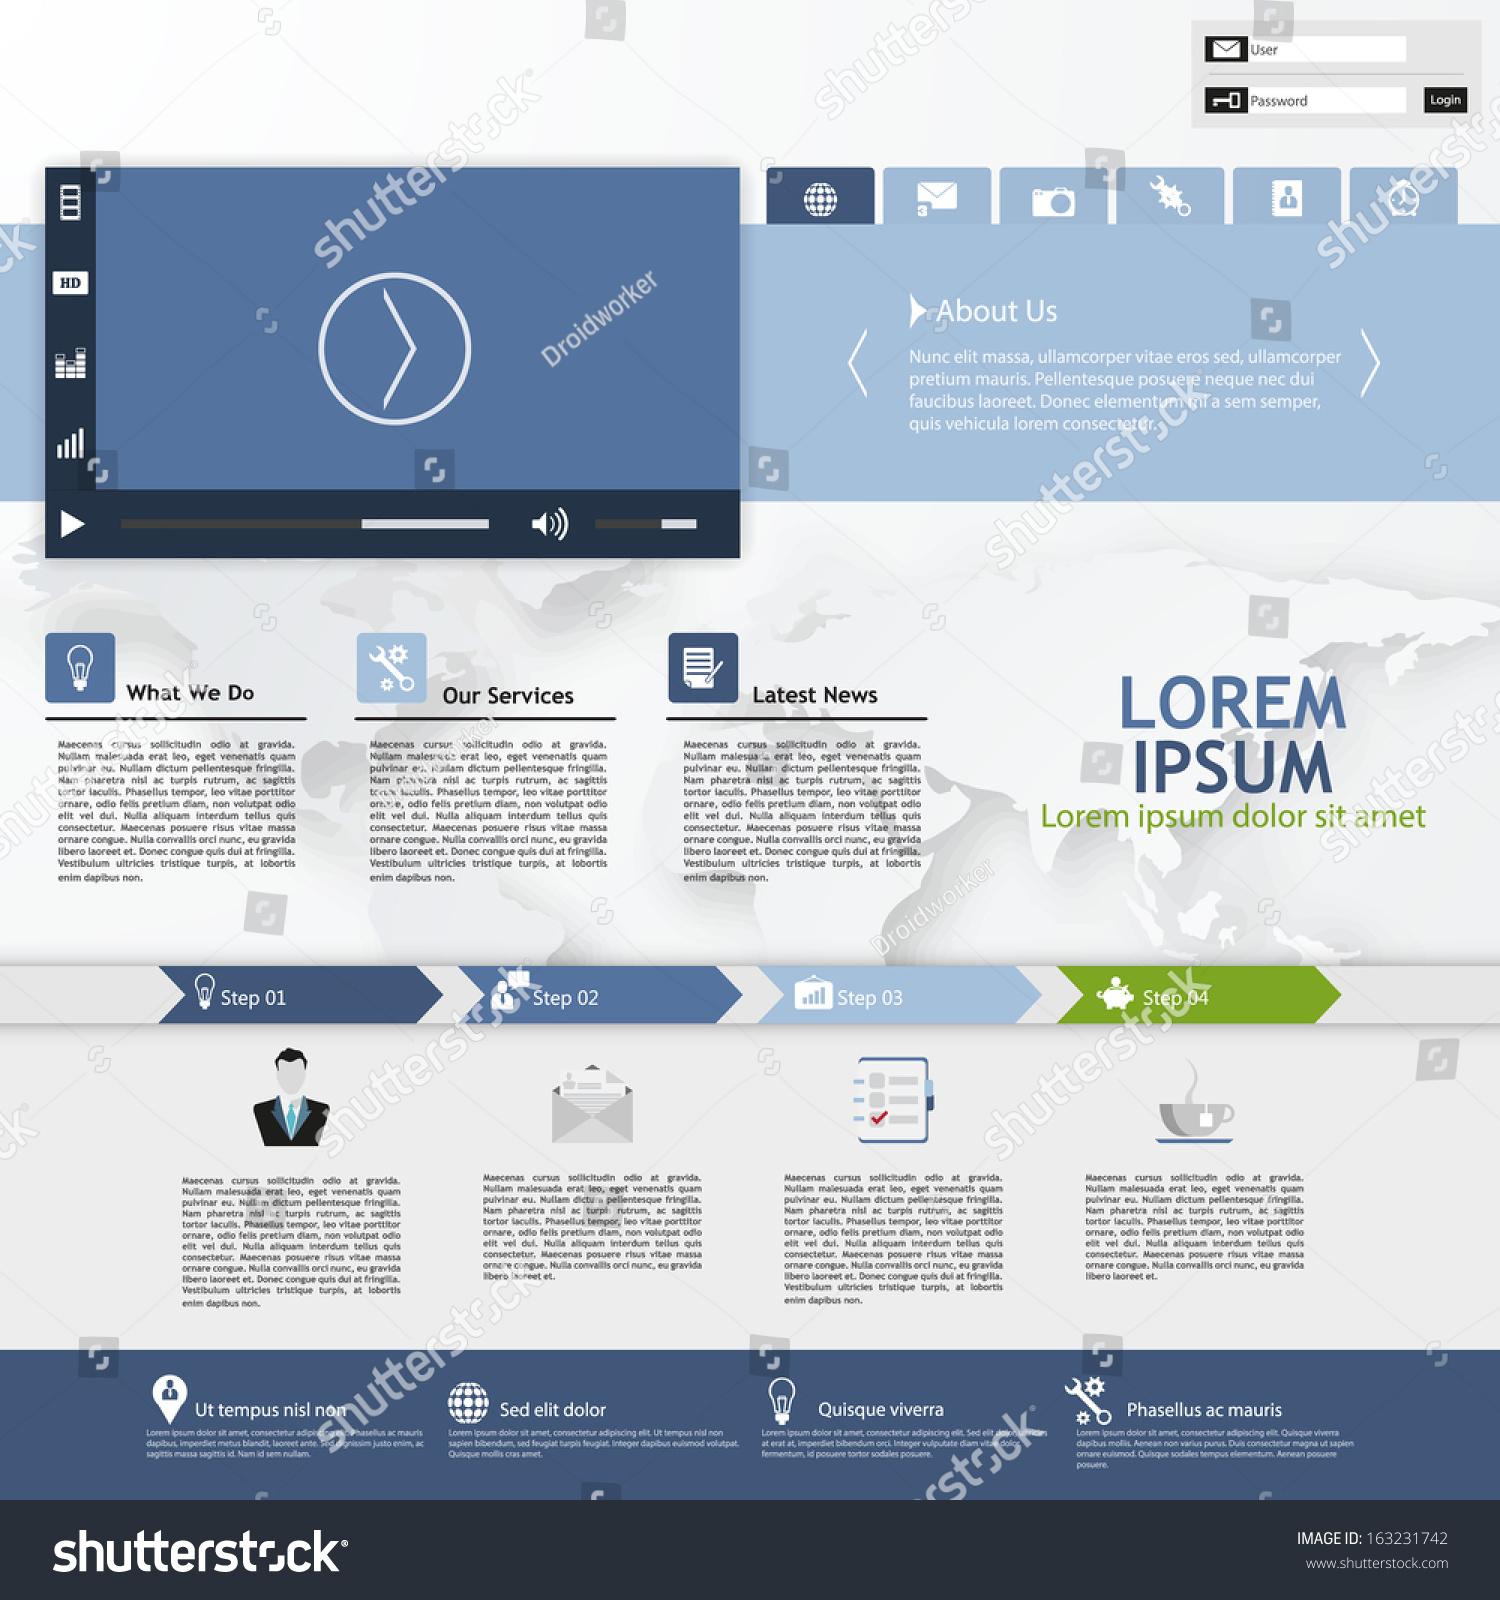 business website template home page design stock vector 163231742 shutterstock. Black Bedroom Furniture Sets. Home Design Ideas